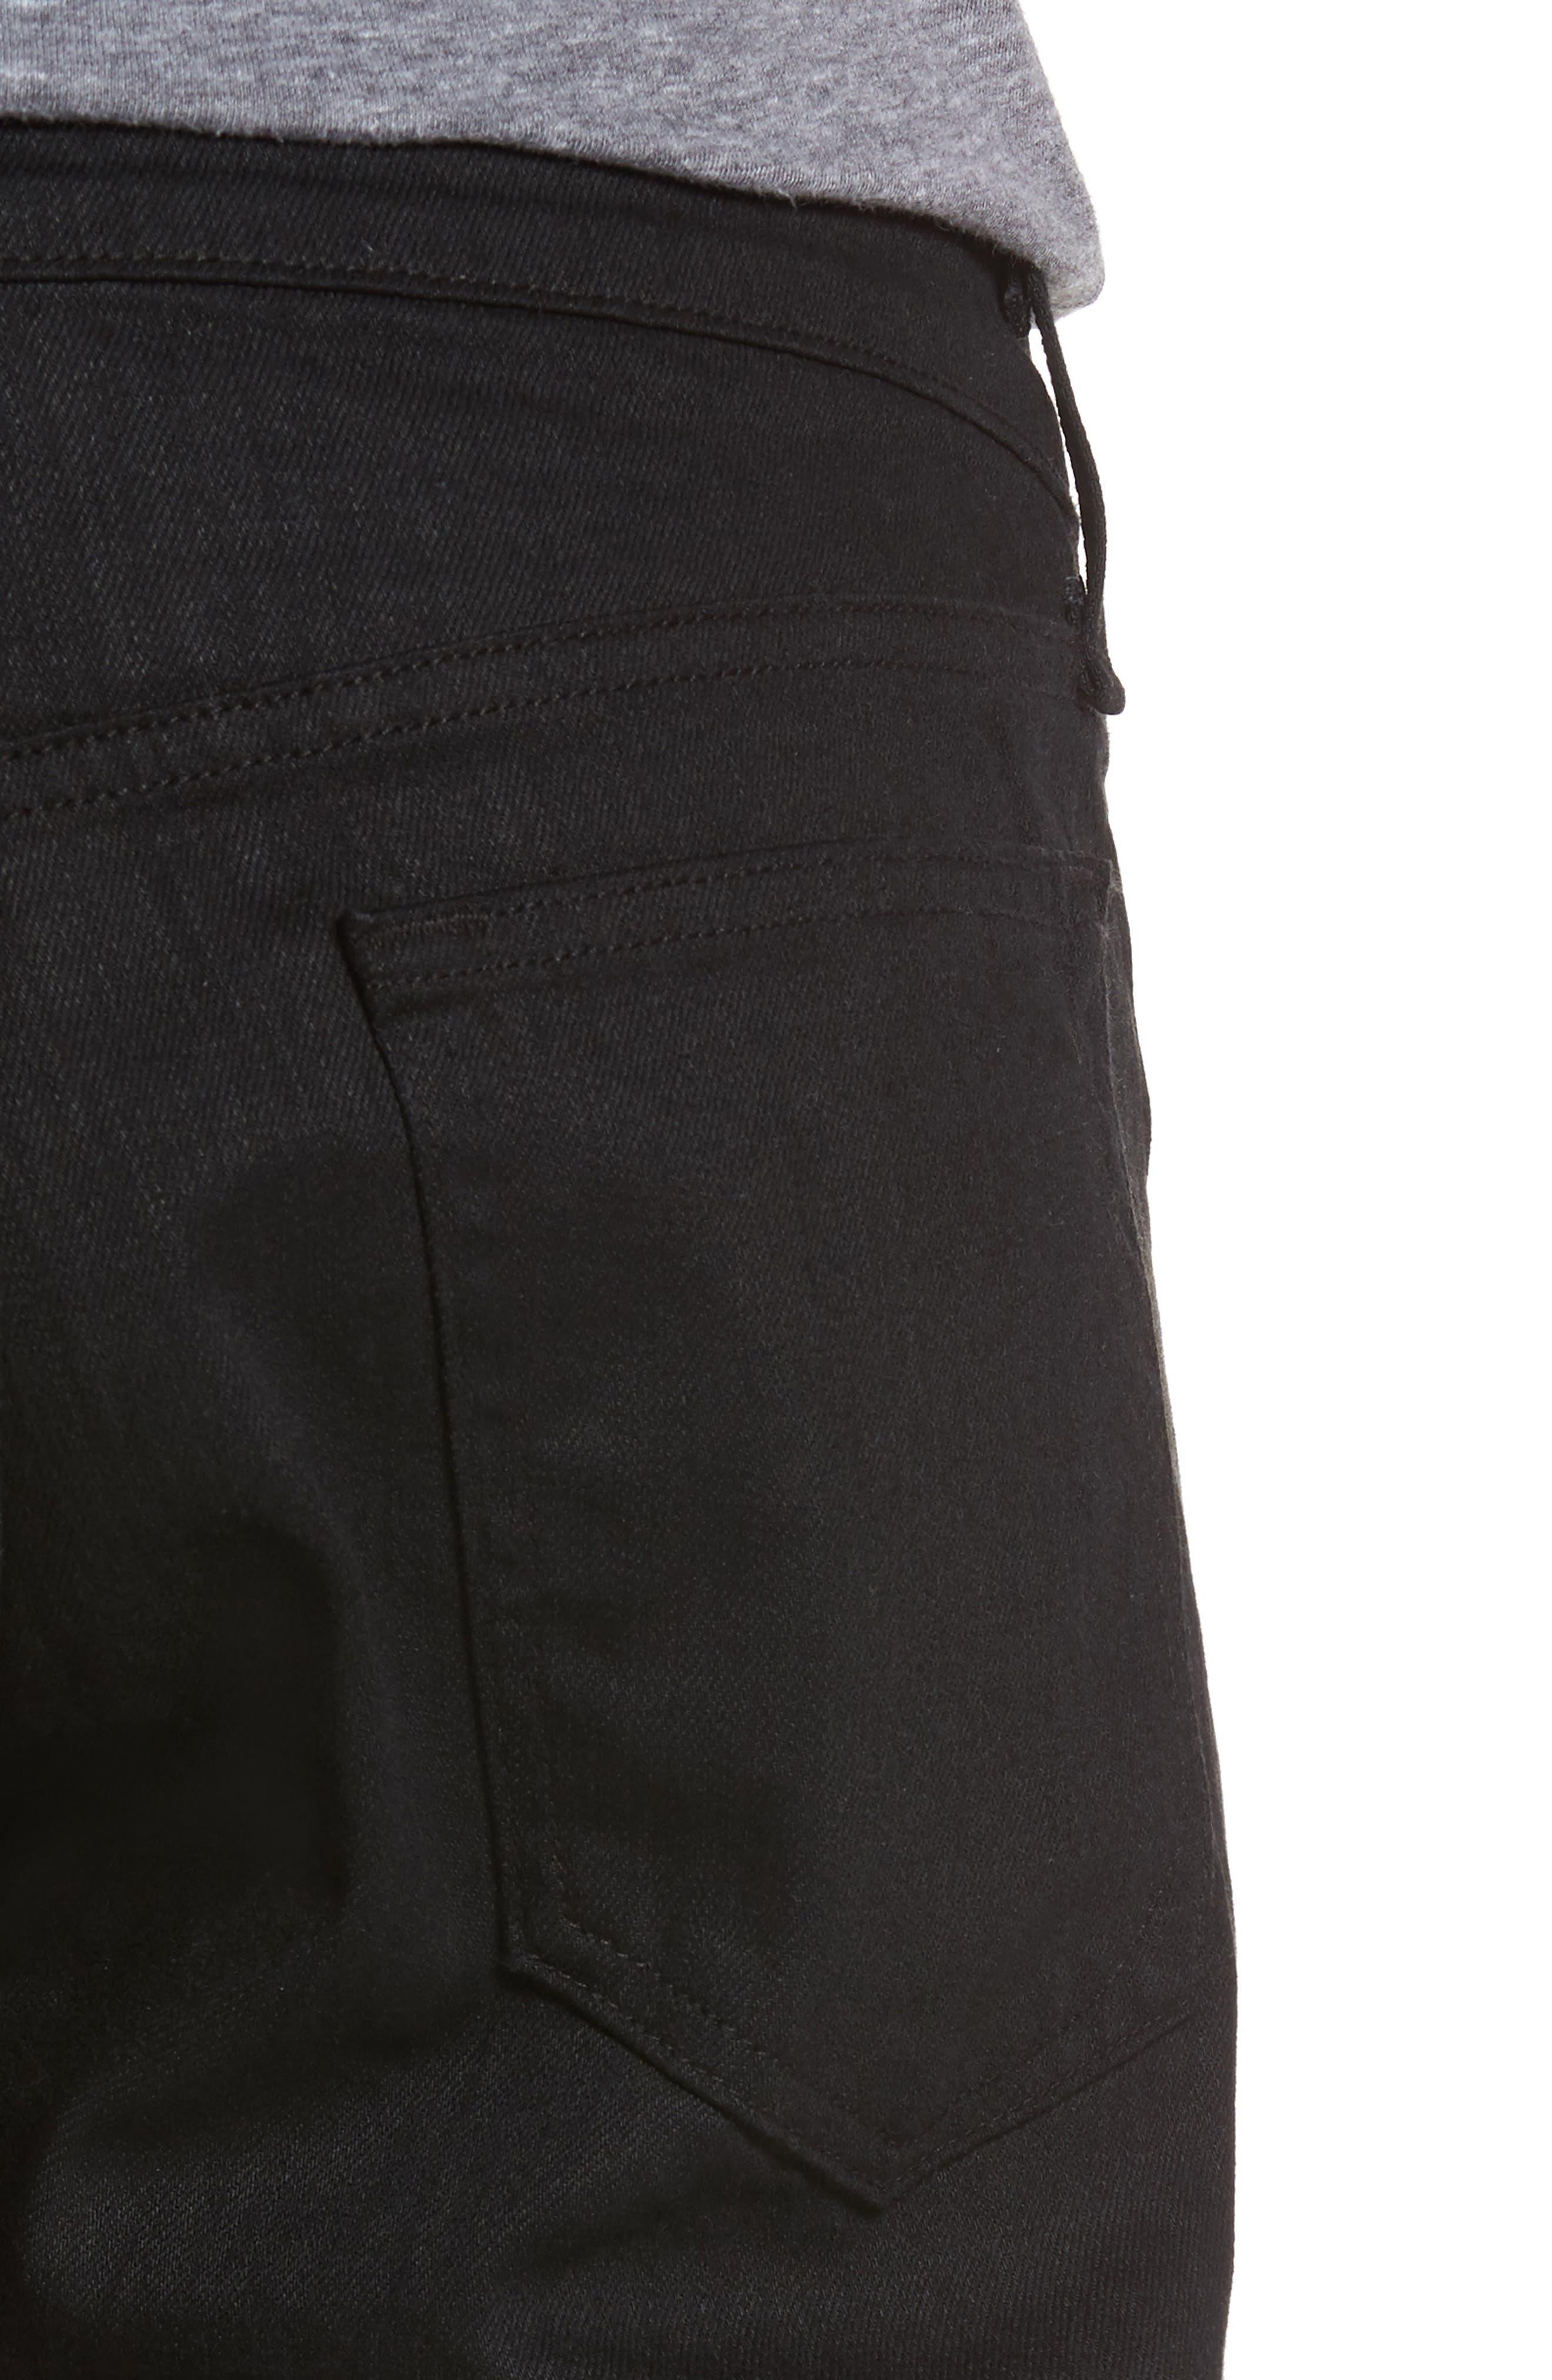 Fit 3 Slim Straight Leg Jeans,                             Alternate thumbnail 4, color,                             BLACK